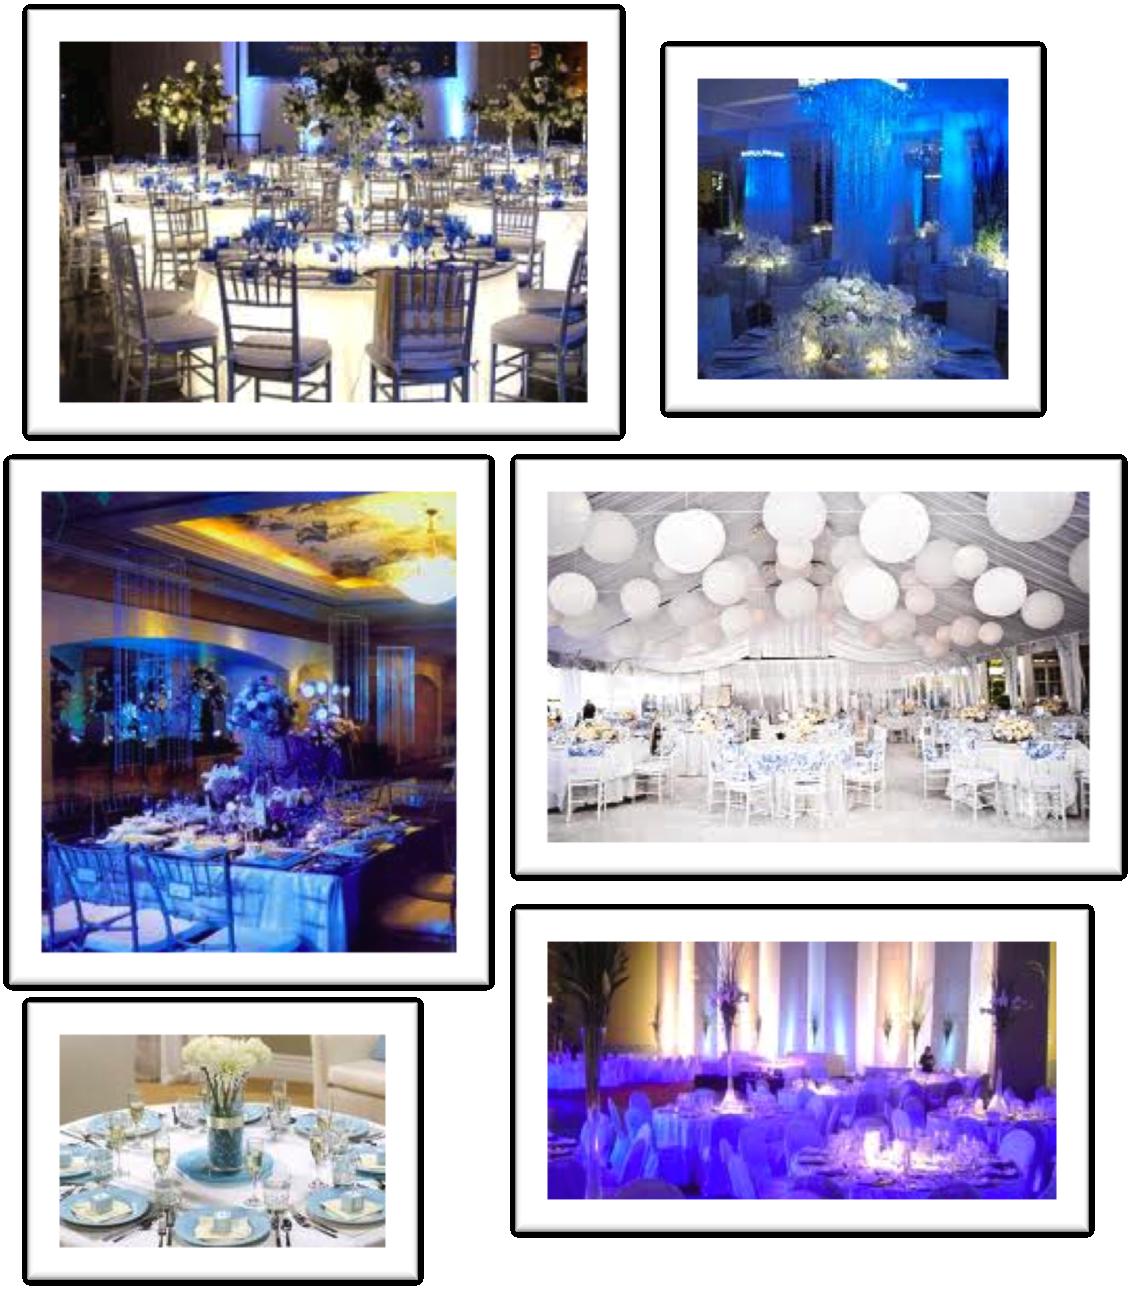 Decoracion bodas blanco y azul d for Decoracion petrole azul